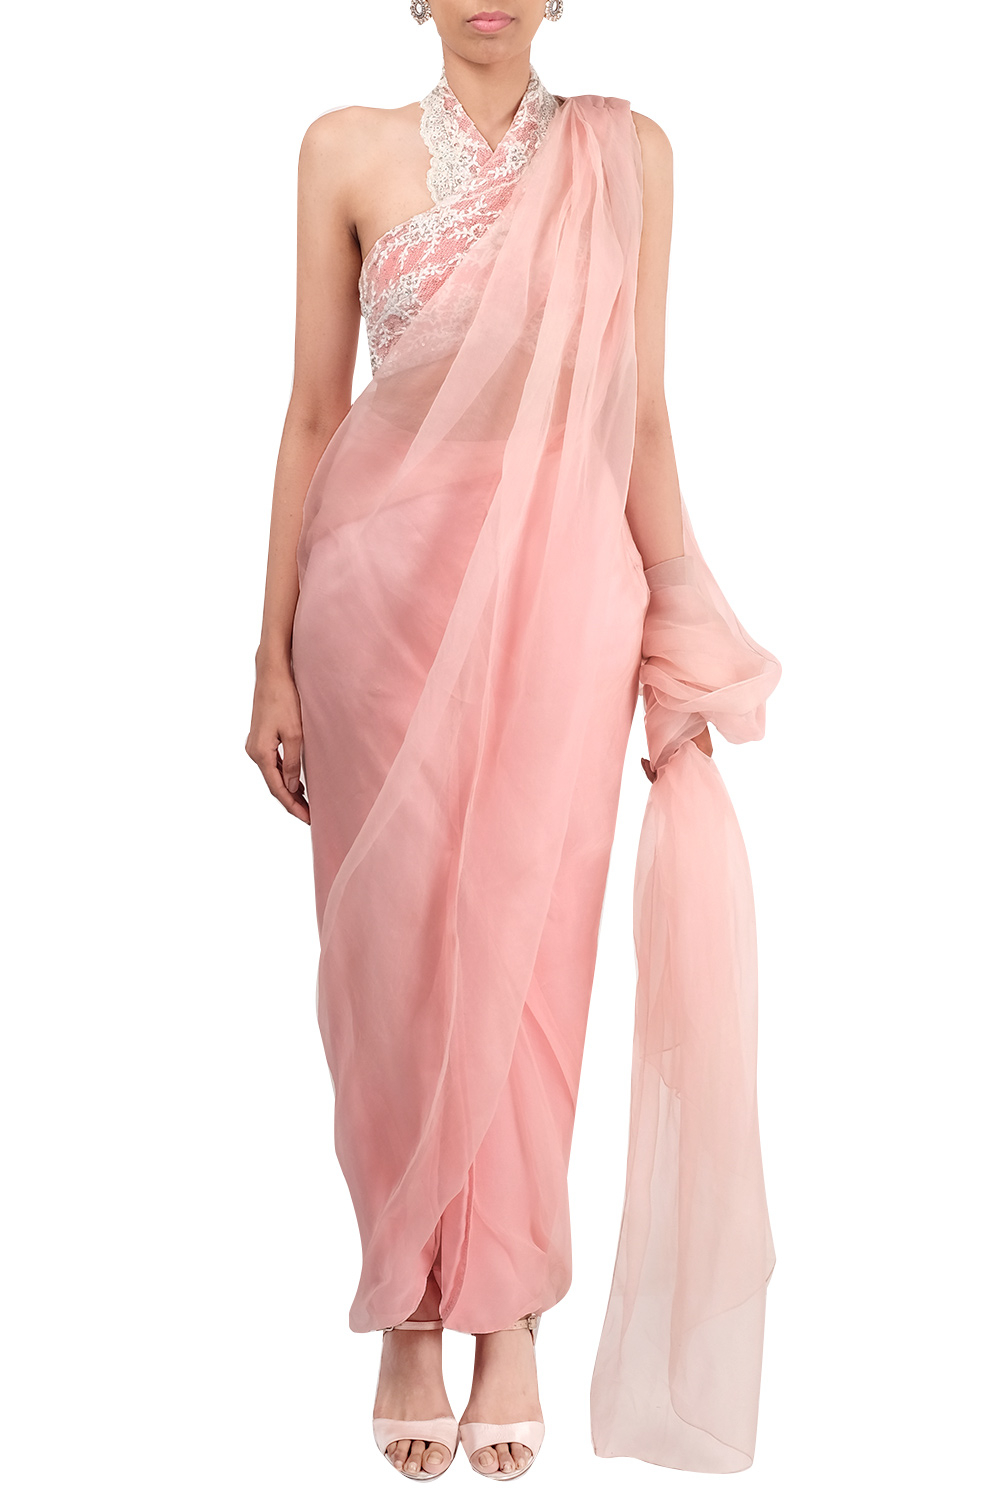 Pink Draped Saree By Shehla Khan Carmaonline Shop